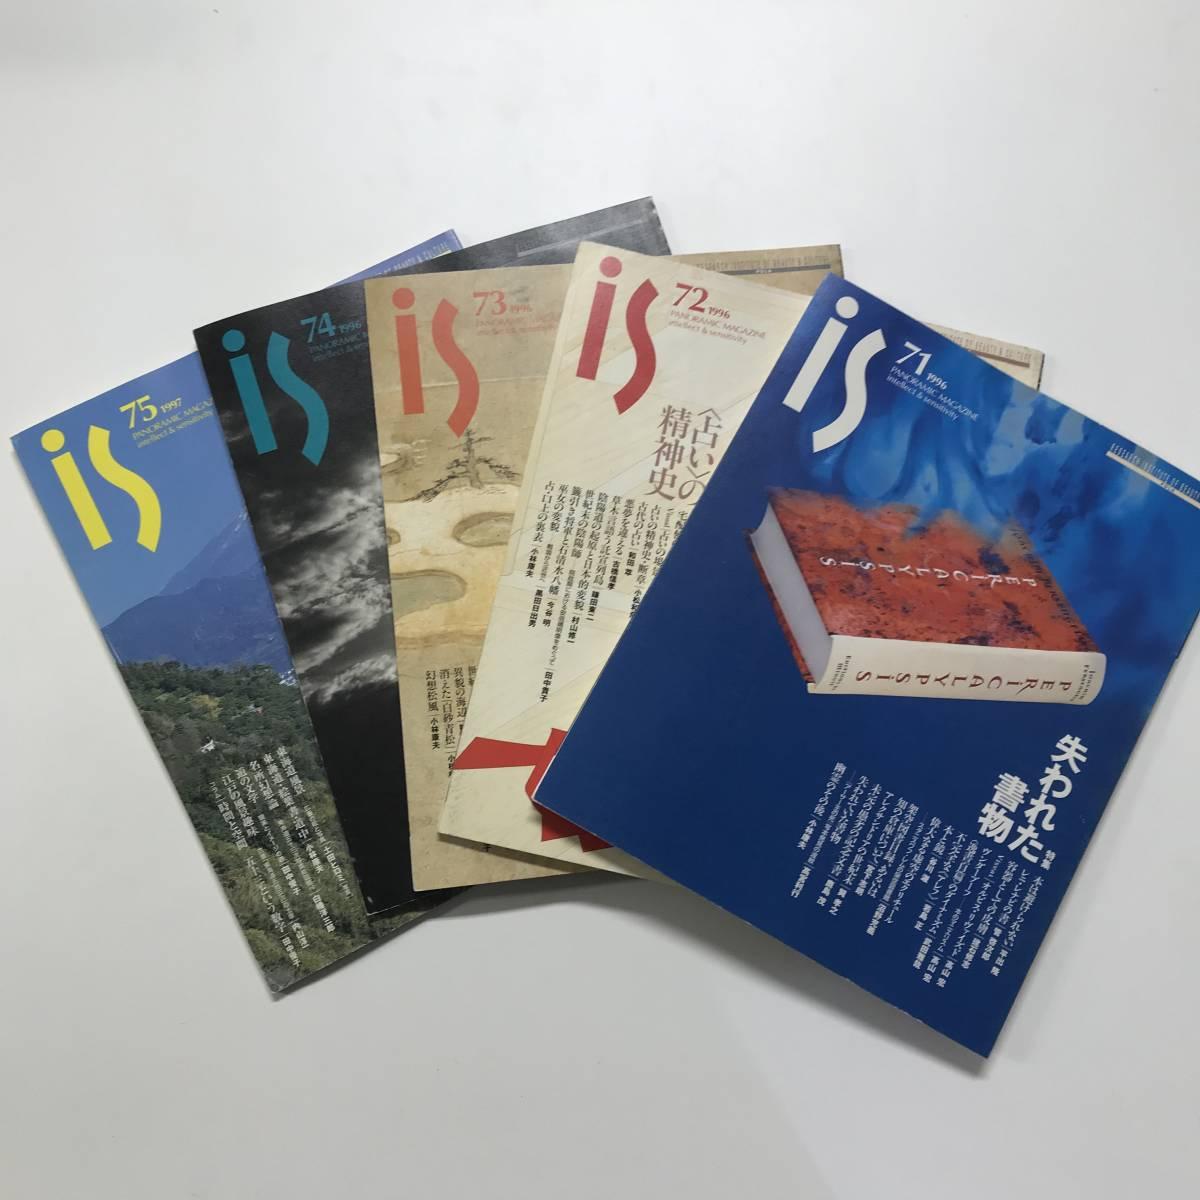 is 75冊セット 1978~1997年 欠番なし t00906_i0_画像8